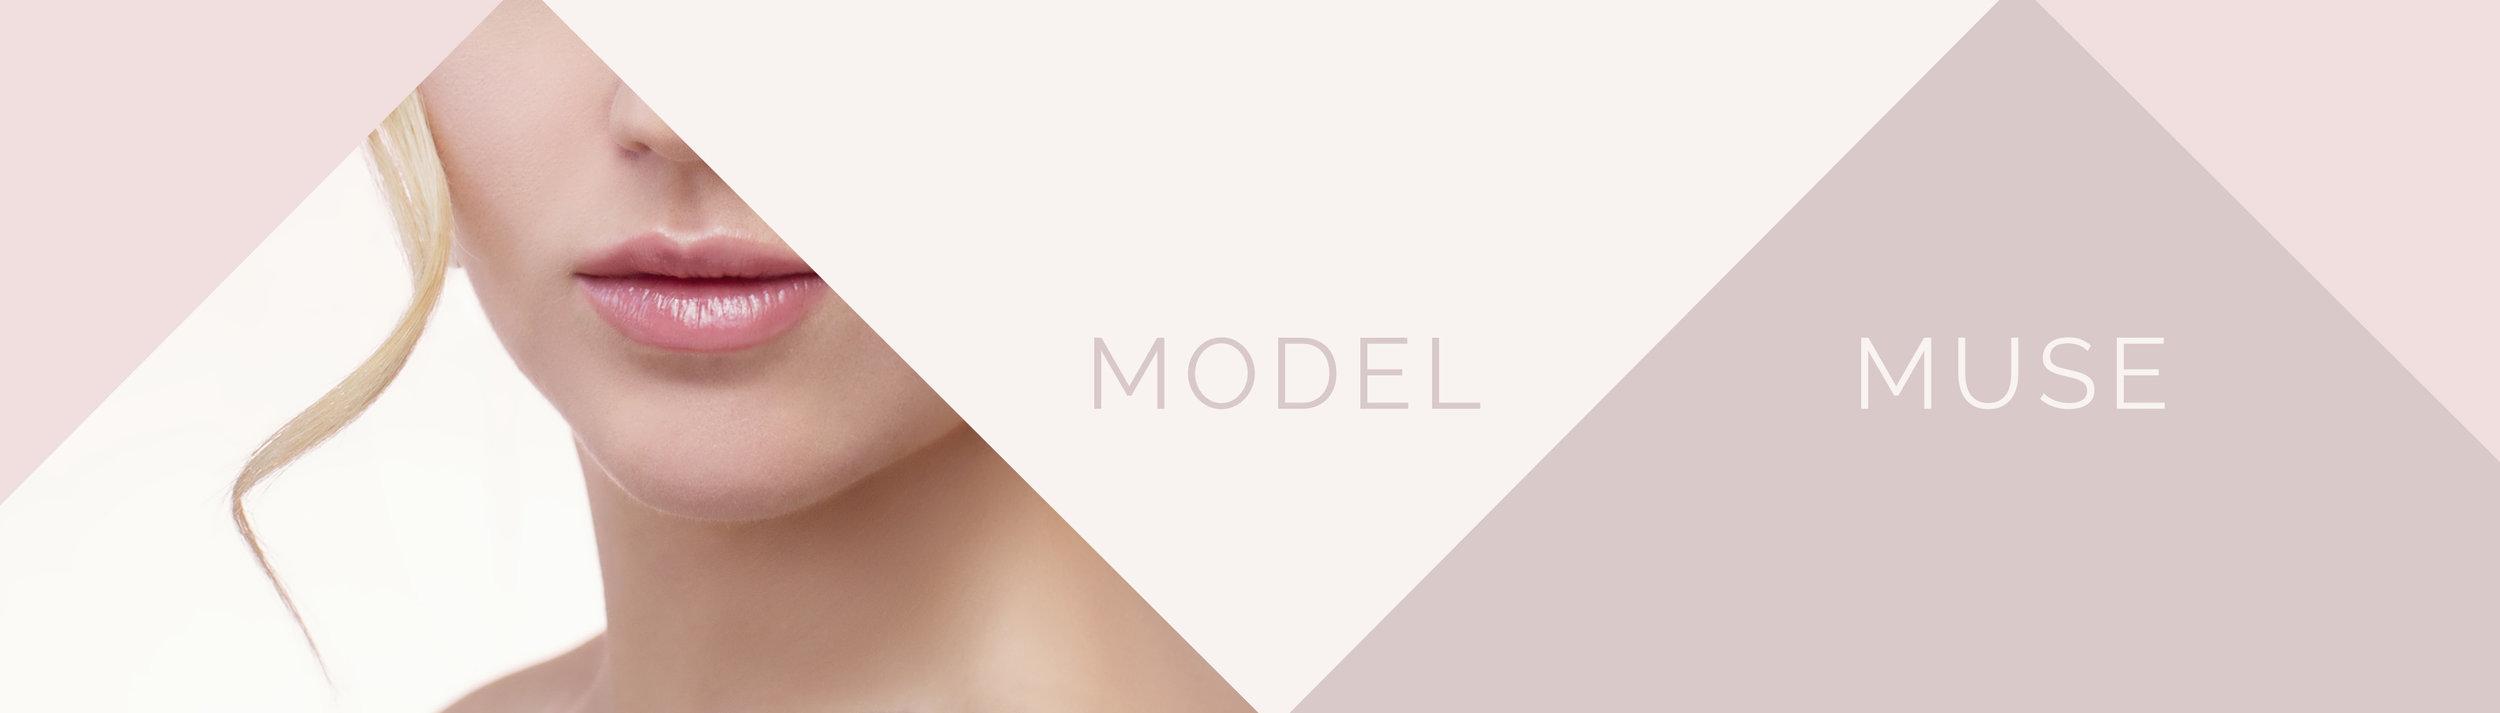 Model Muse 2.jpg